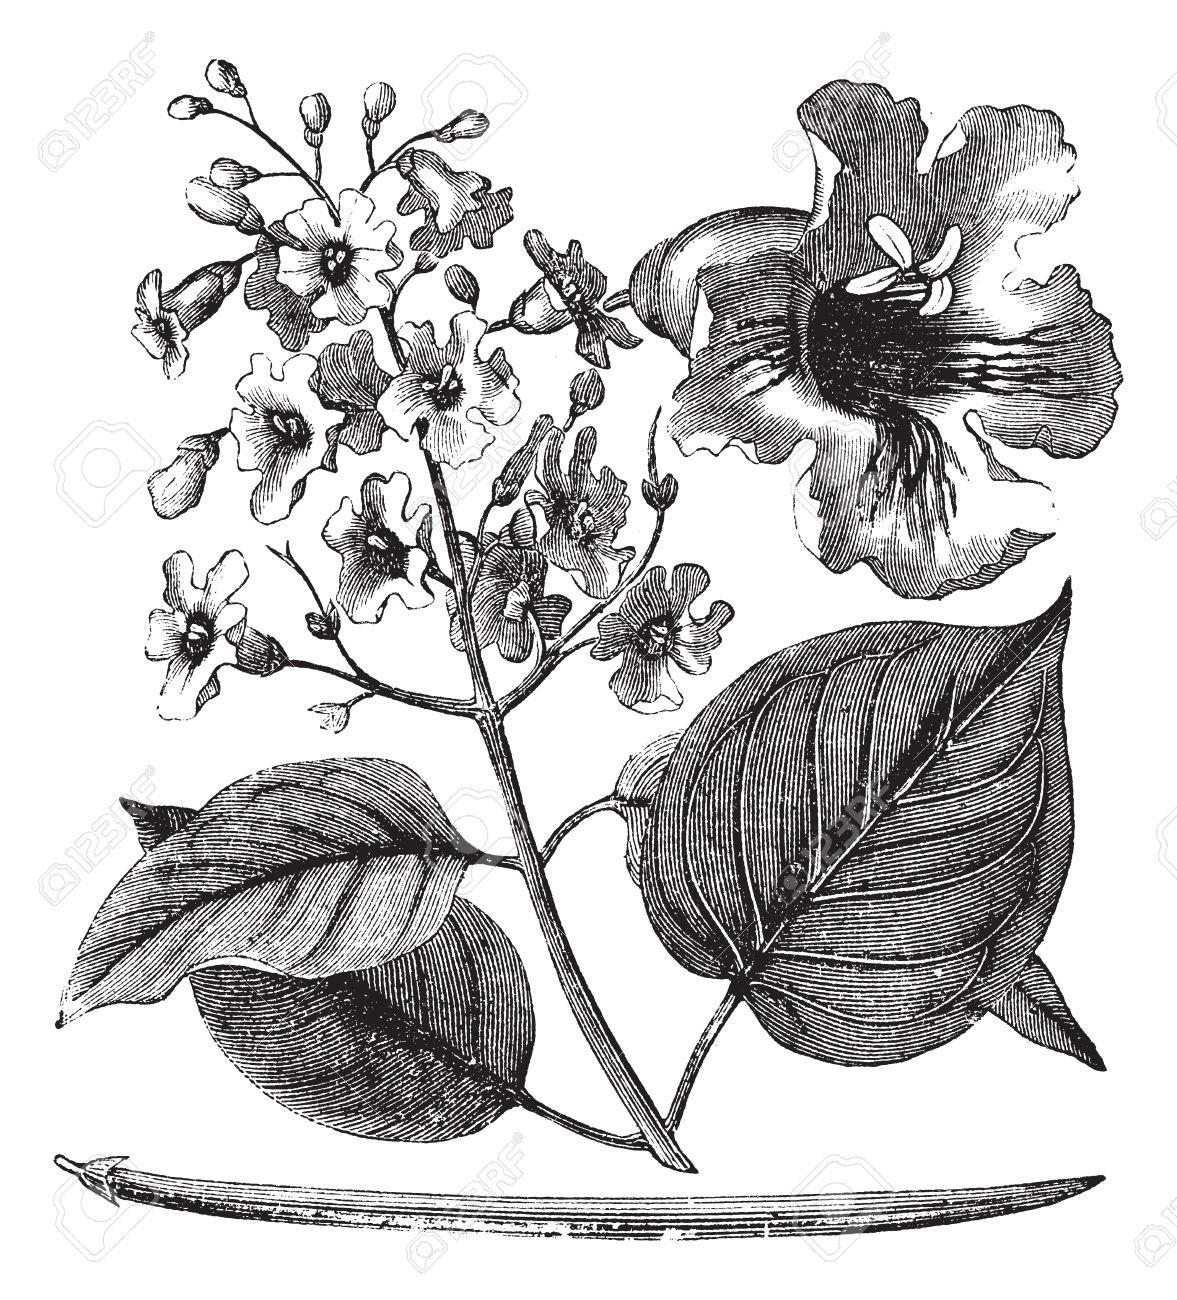 Catalpa Bignonioides Or Cigar Tree Vintage Engraving. Old Engraved.